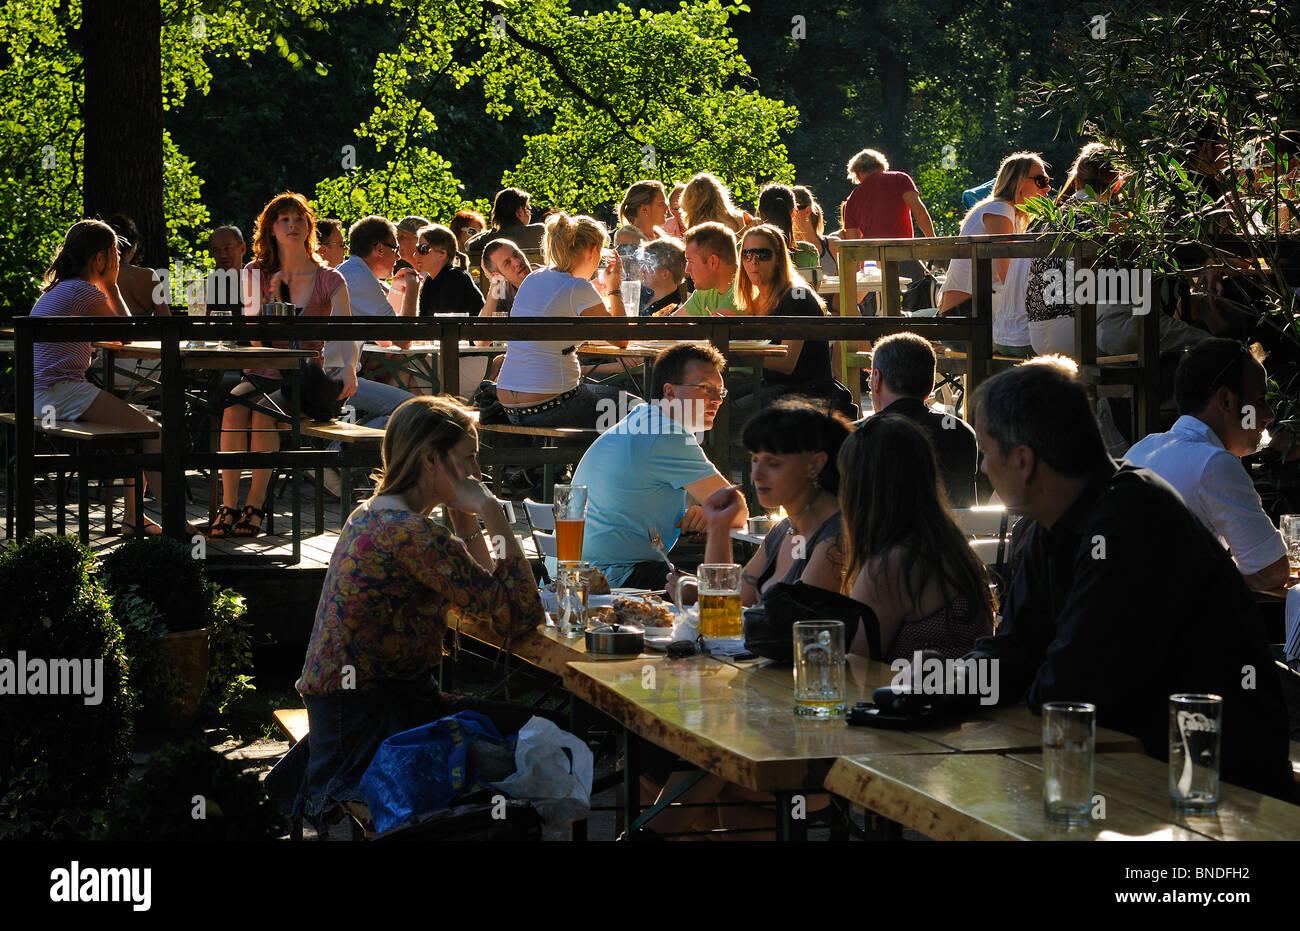 Café am Neuen See, beer garden, Neuer See lake im Grosser Tiergarten, Tiergarten, Mitte, Berlin, Germany, Europe - Stock Image